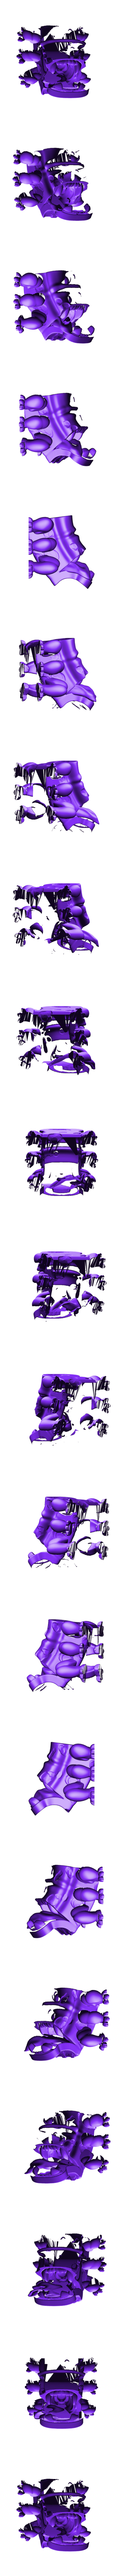 dreadloaf.stl Download free STL file Dread Bread • 3D print template, HeribertoValle